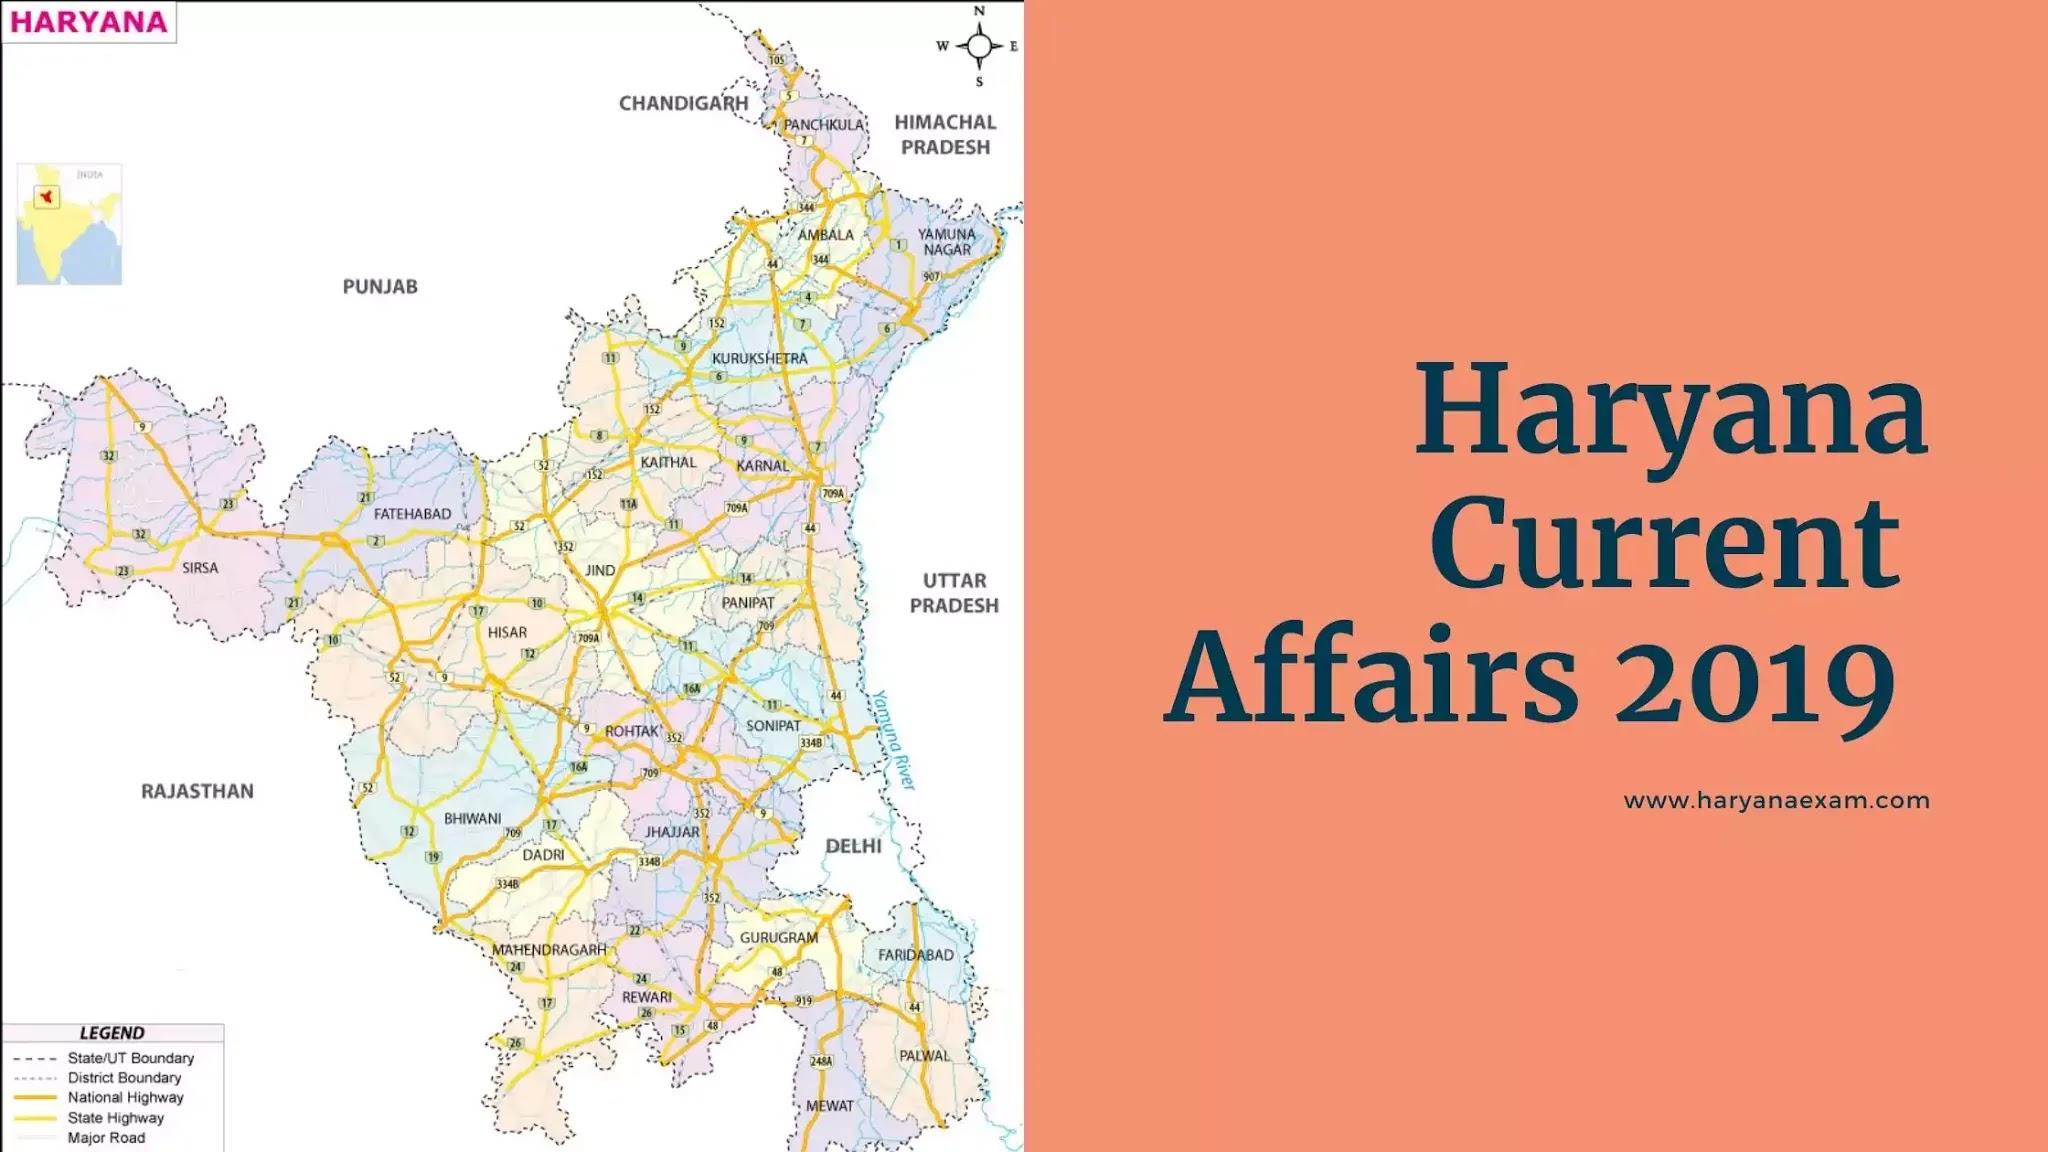 Haryana Current Affairs 2019